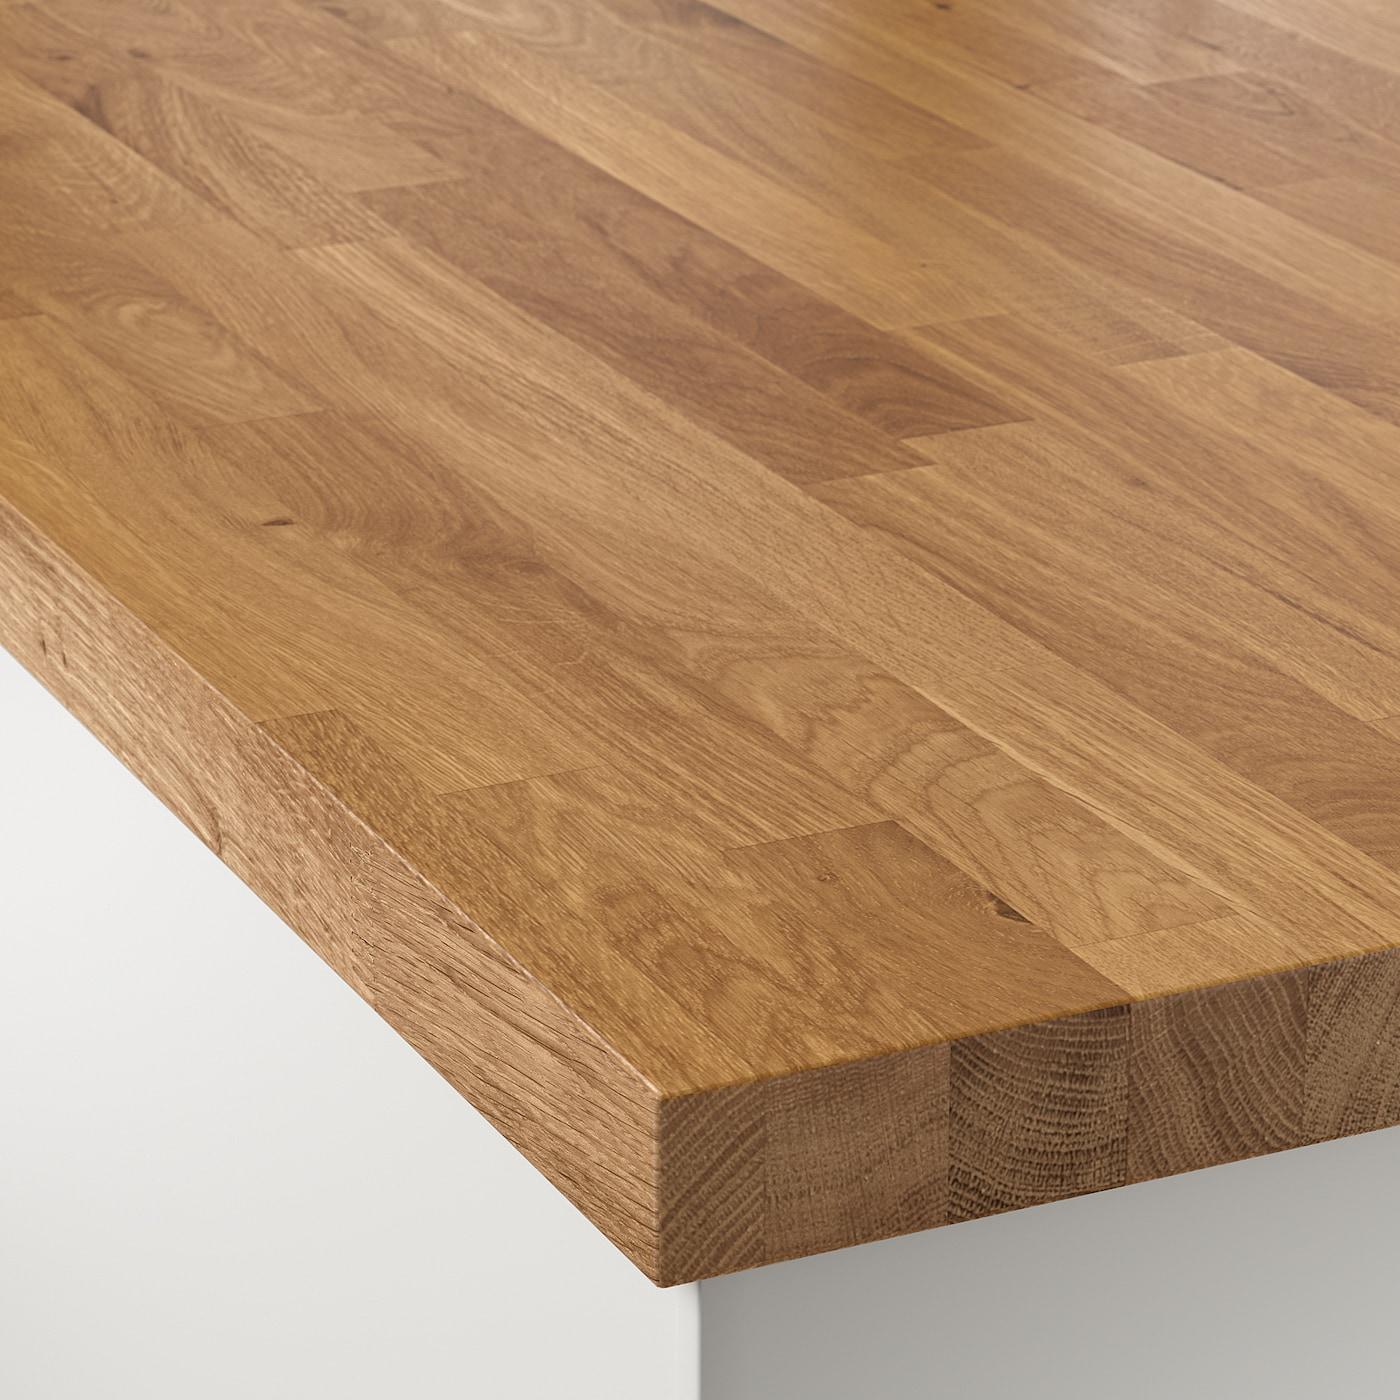 Plan De Travail Ikea Bois Massif skogarp plan de travail sur mesure - chêne, bois massif 45.1-63.5x4.0 cm